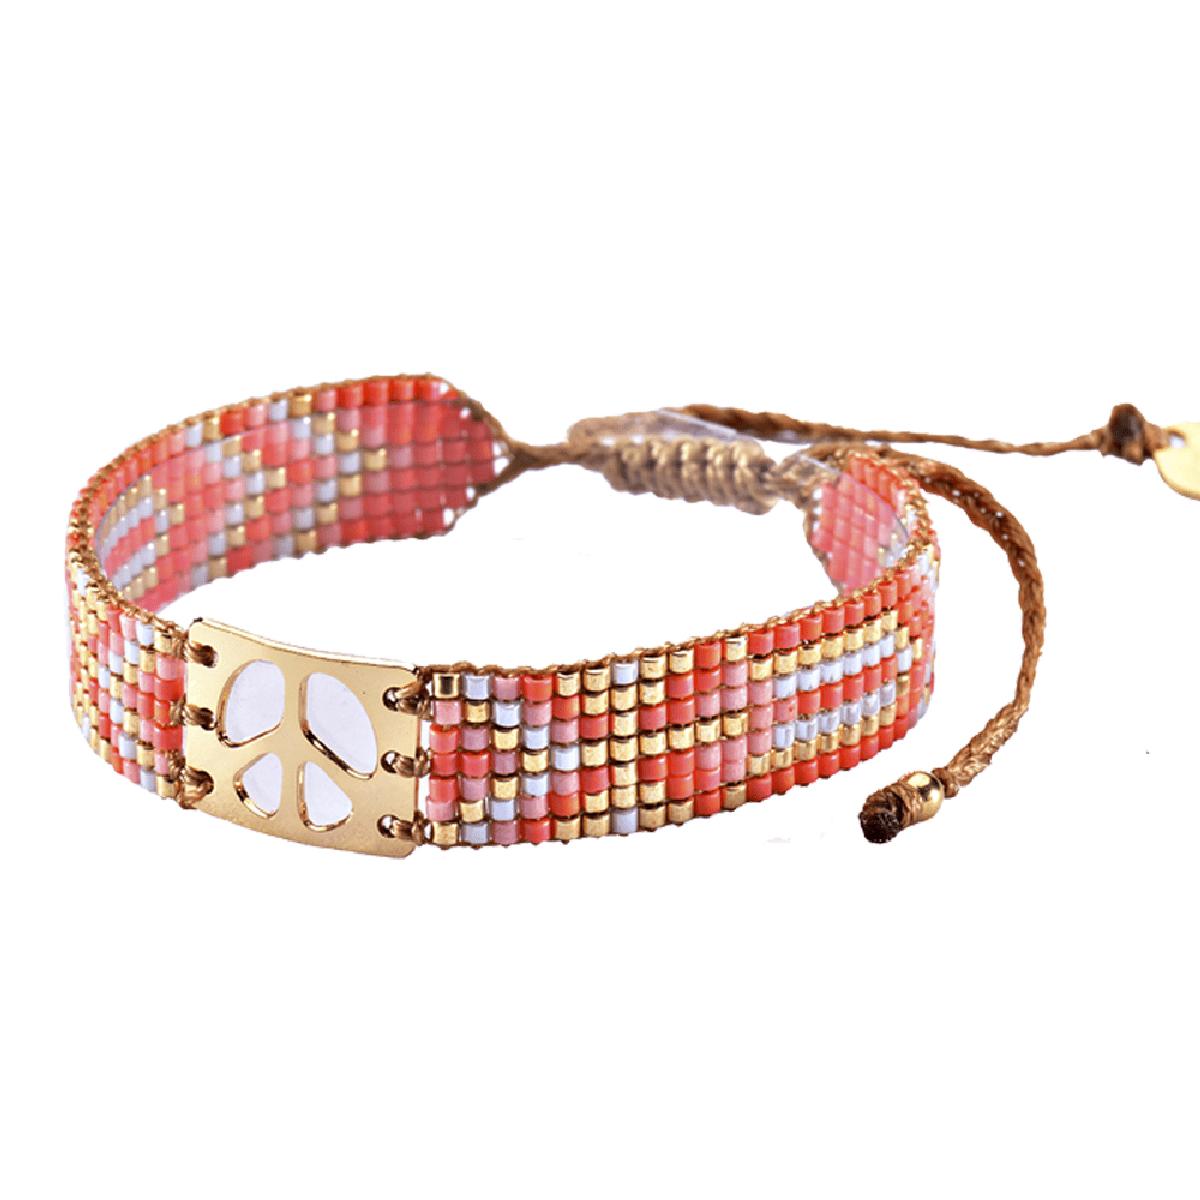 MISHKY, Bracelet Mini Peace en perles multicolores corail, rose & or - cassisroyal.com